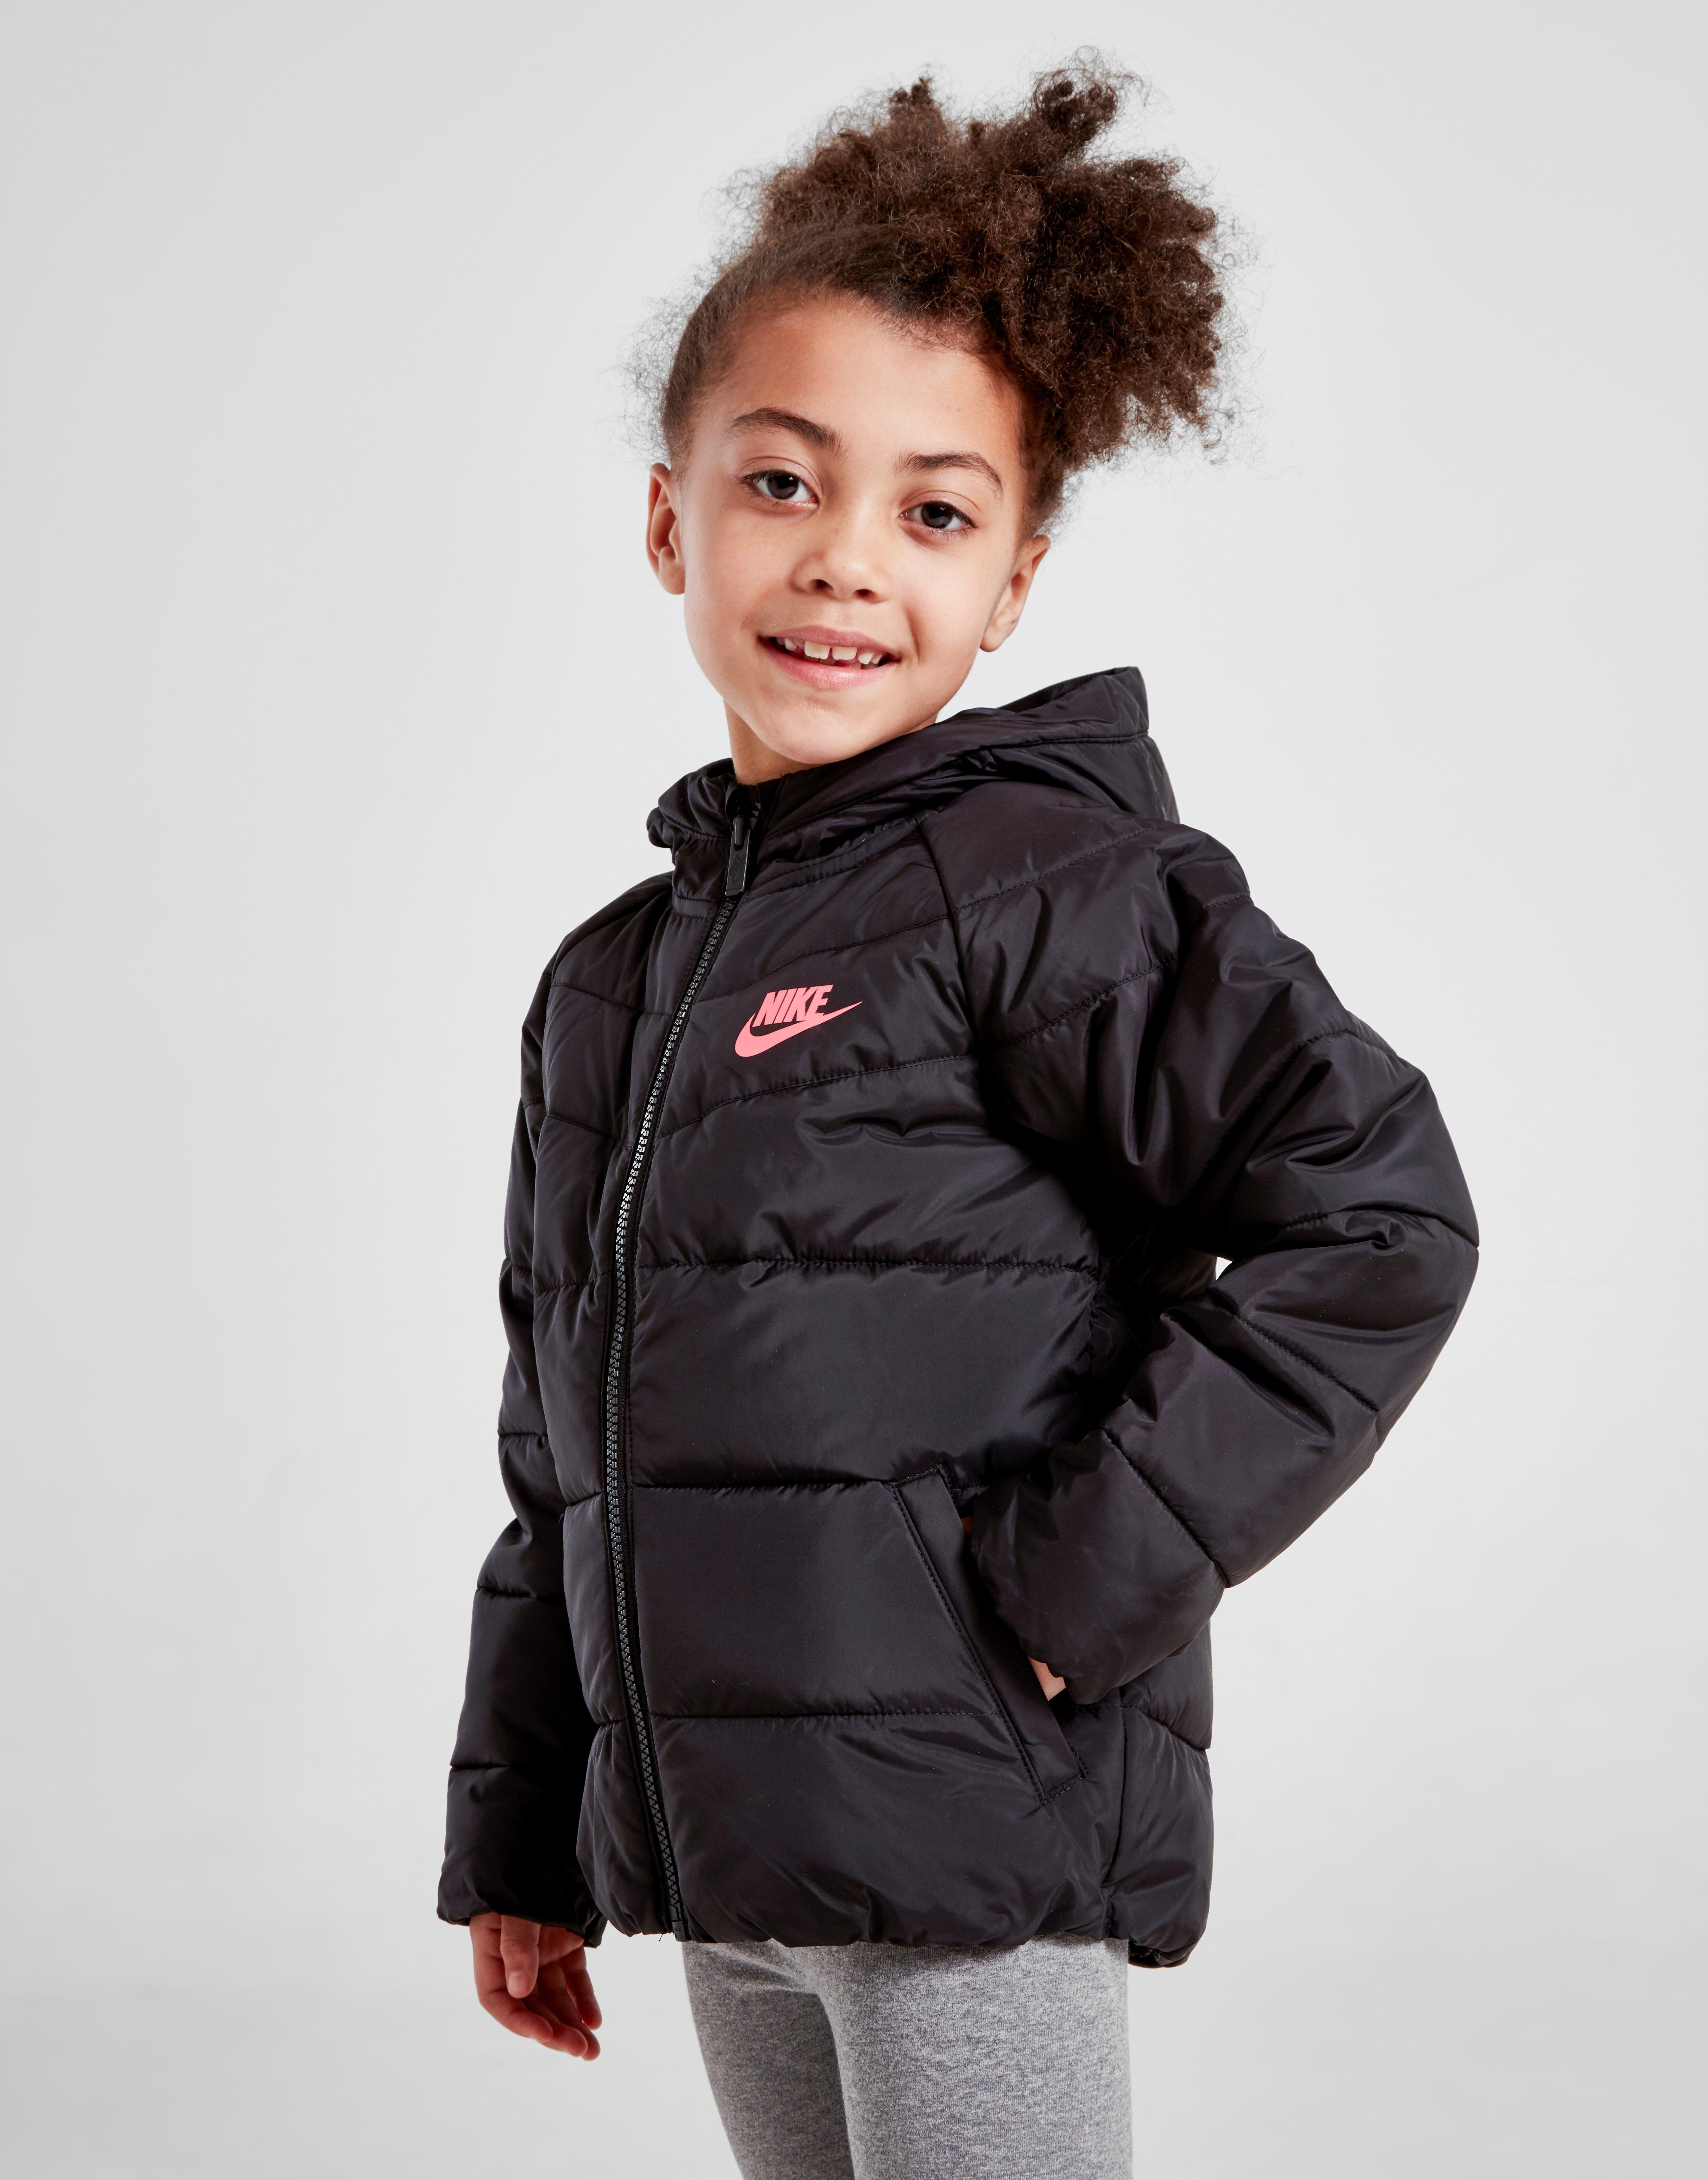 Girls Nike Little Kids Pink Filled Jacket Pink   £60.00